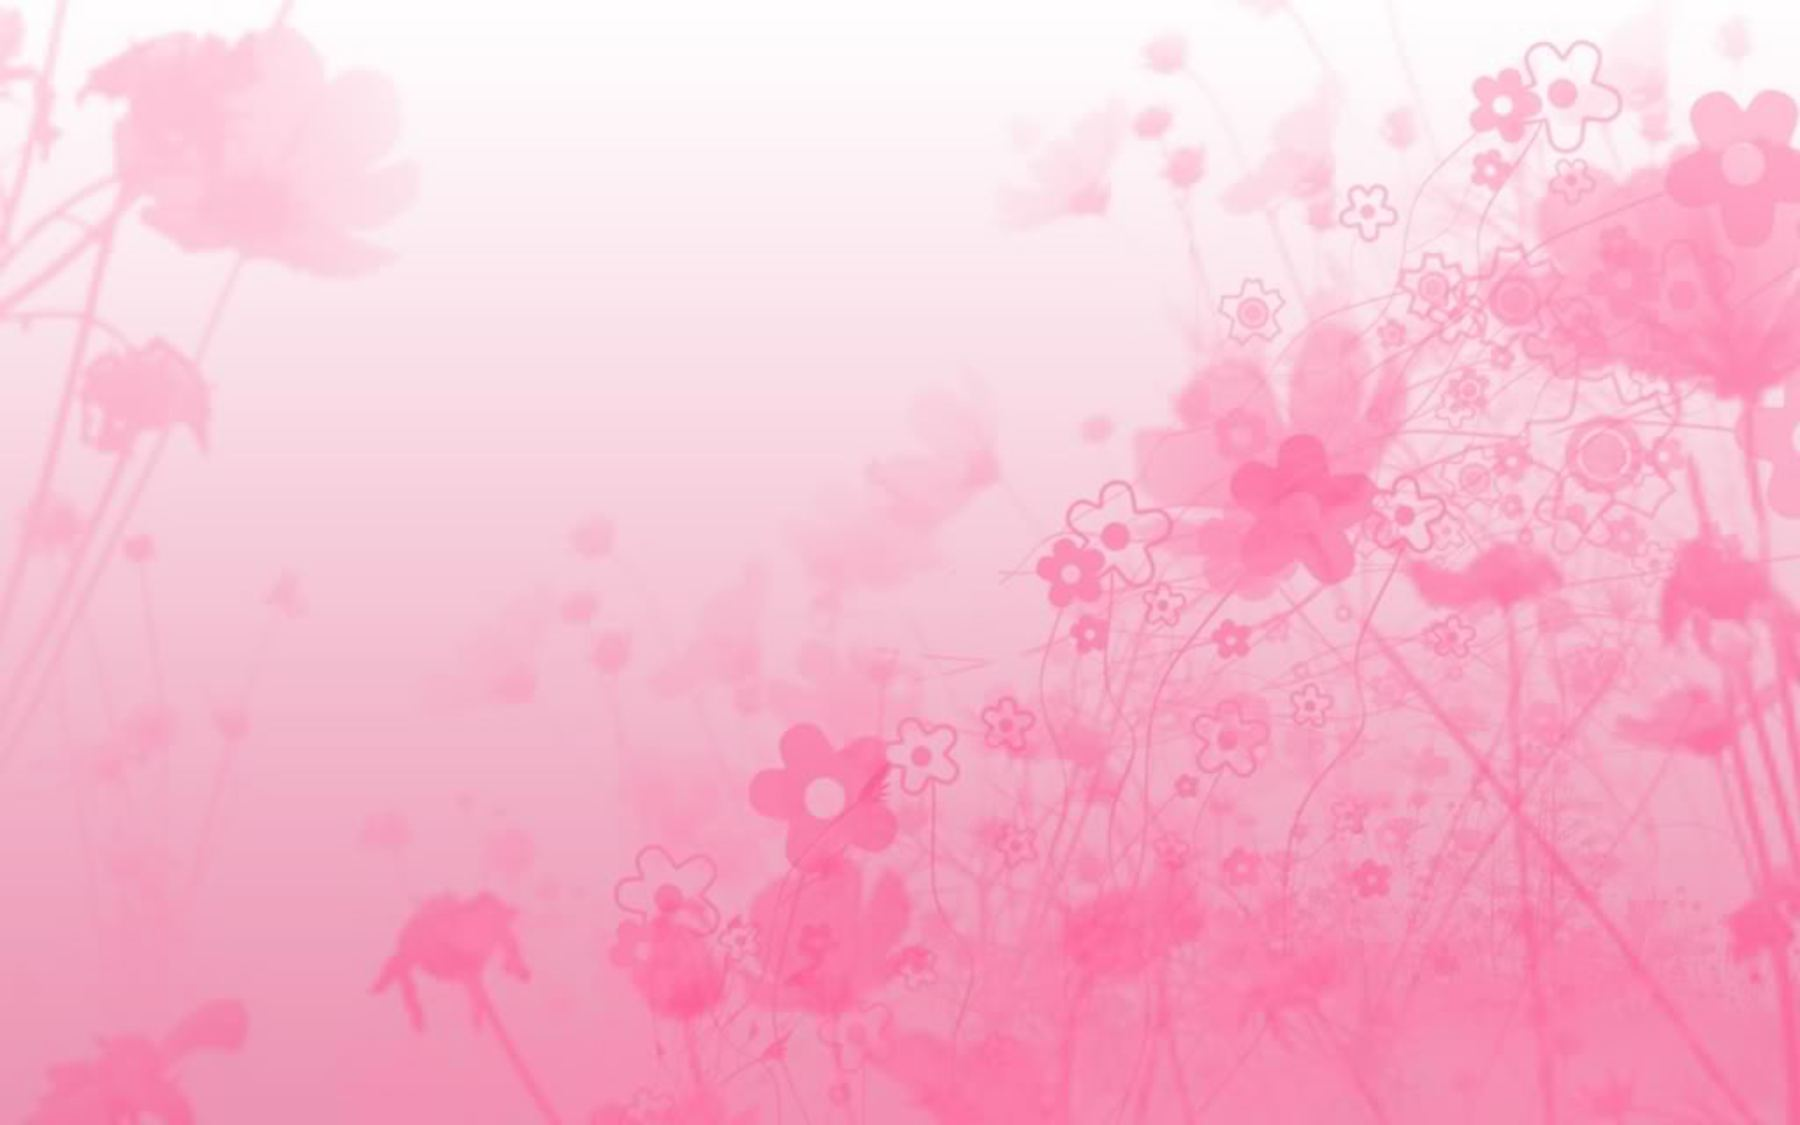 Pink-Abstract-Flower-X-Sch-Ne-Rosa-Blume-80229